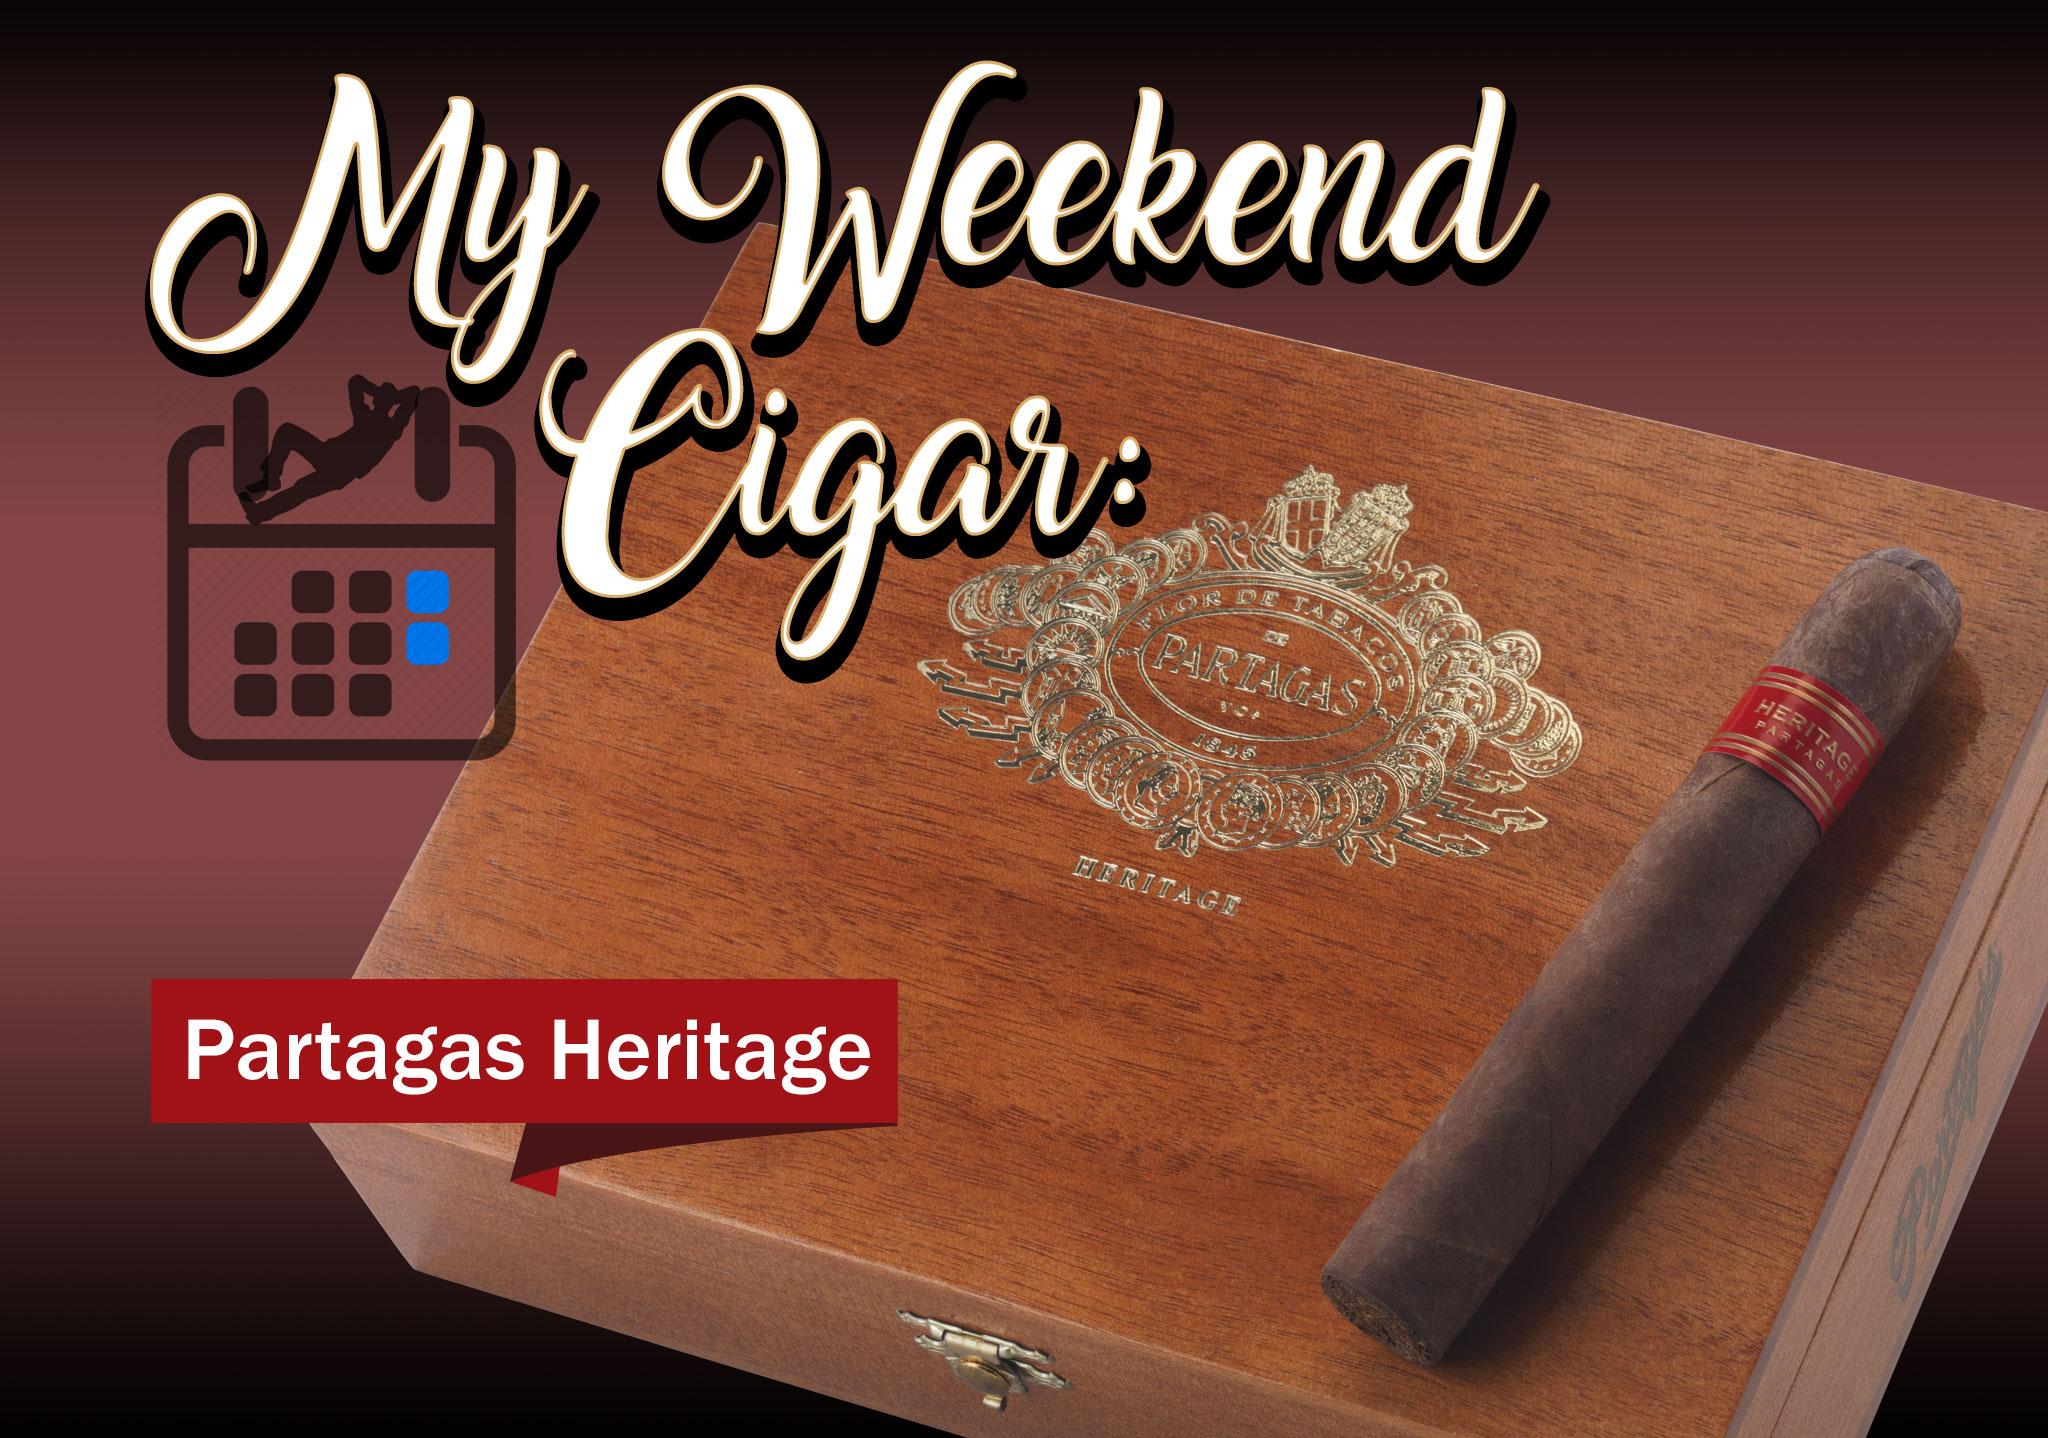 My Weekend Cigar: Feb. 5, 2018 – Partagas Heritage Robusto